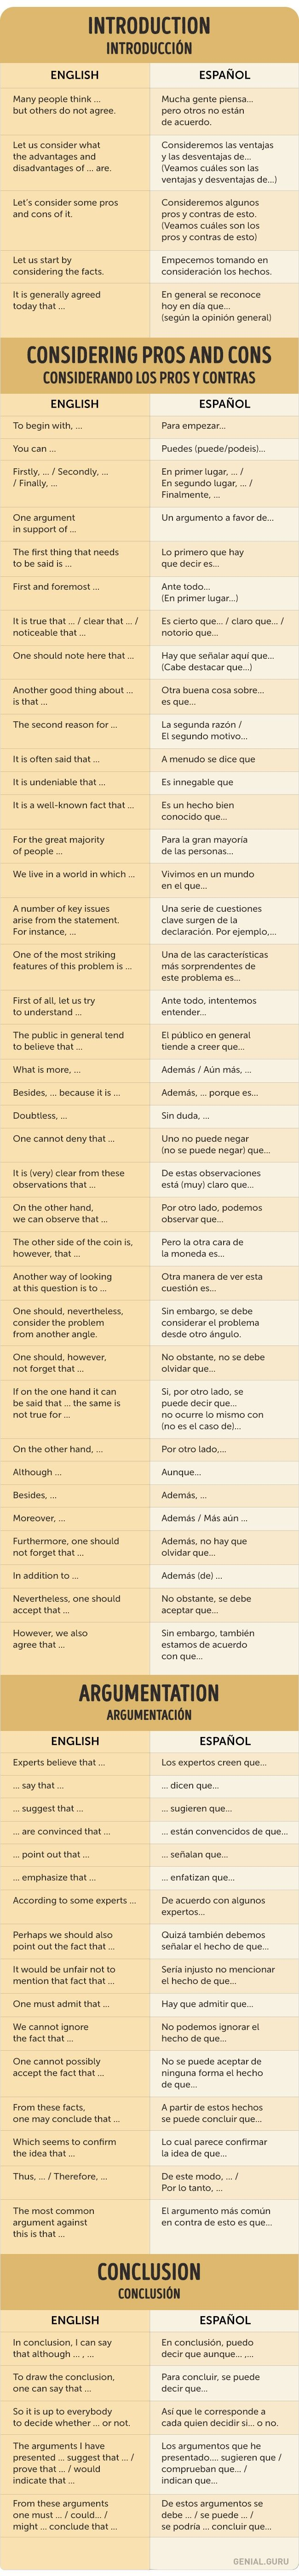 50 Frases en inglés para sobresalir en cualquier debate